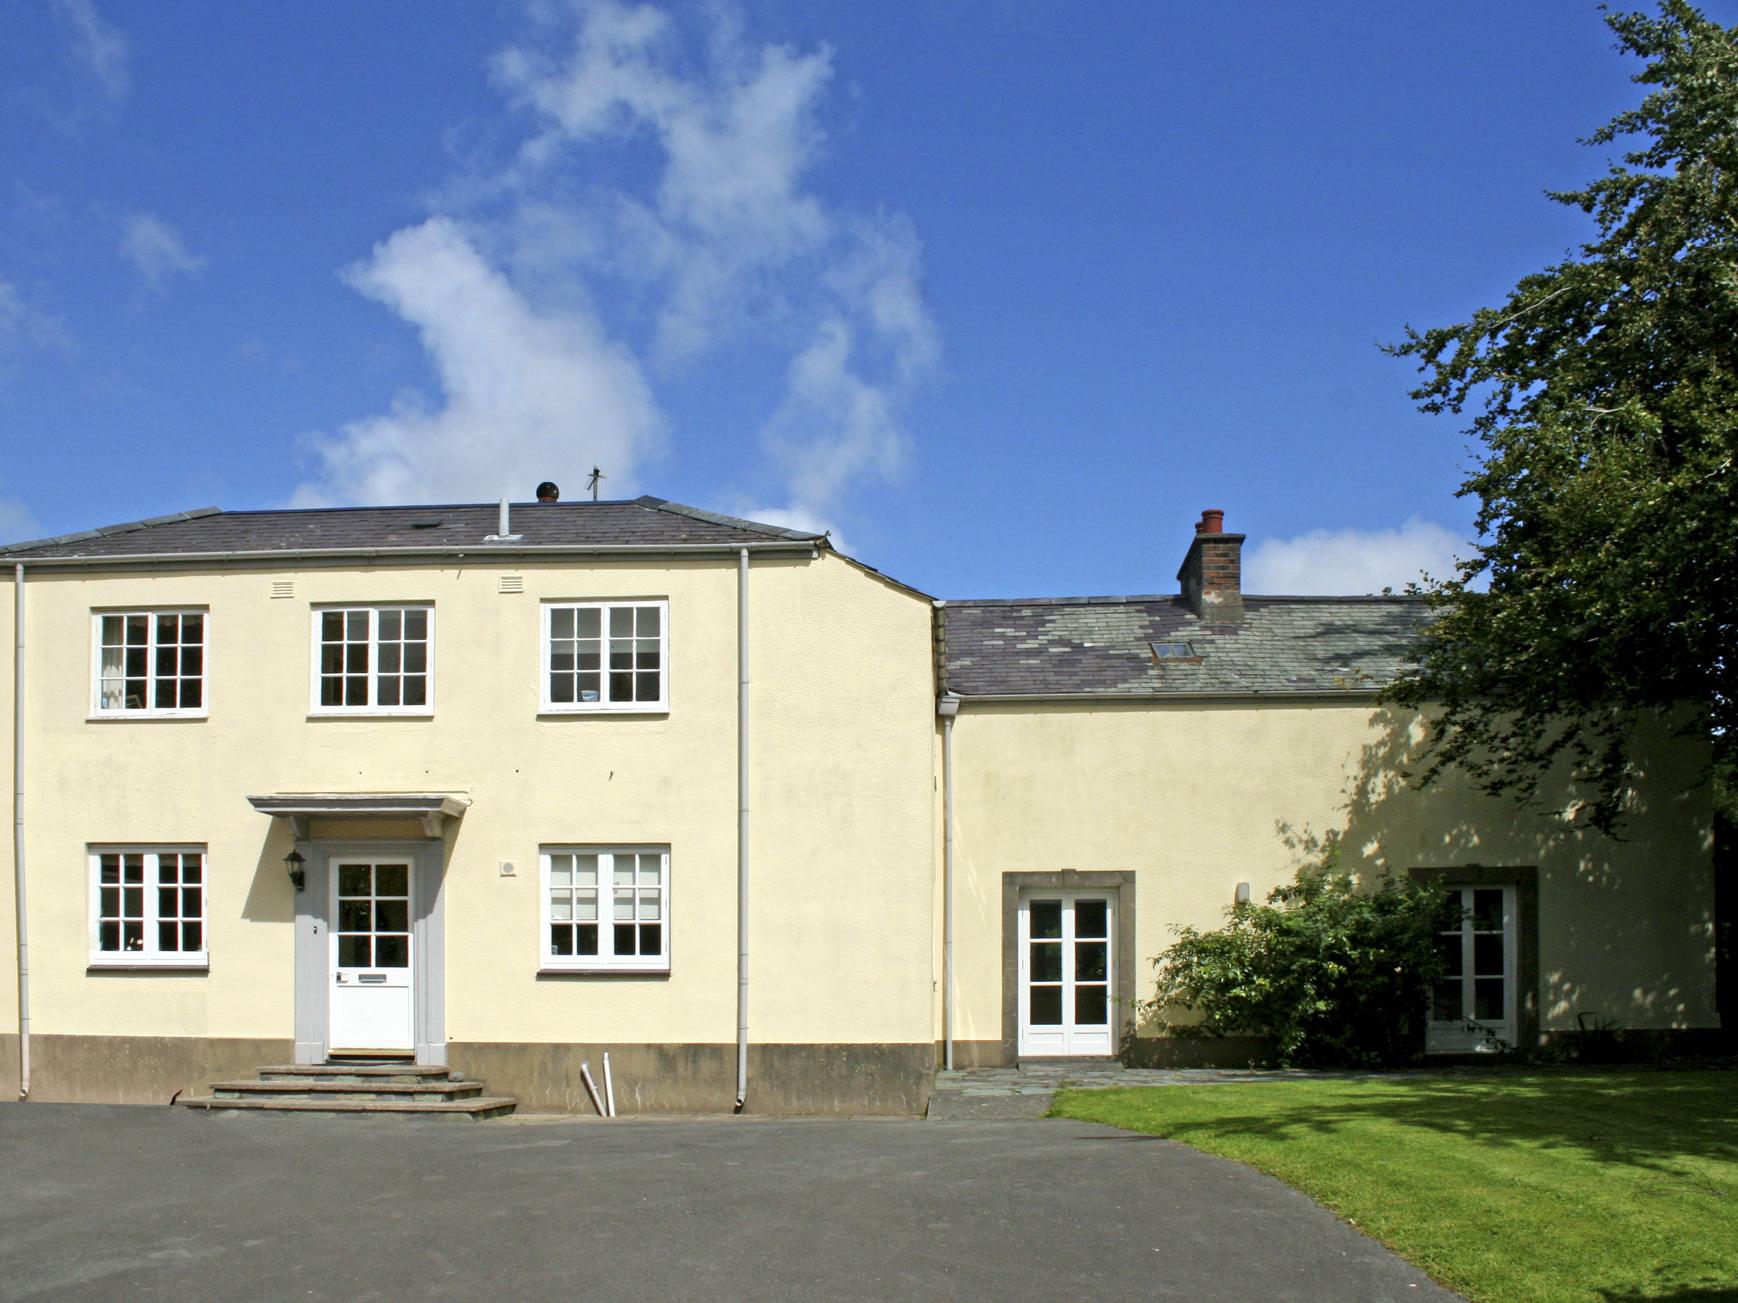 6 bedroom Cottage for rent in Bangor - Wales